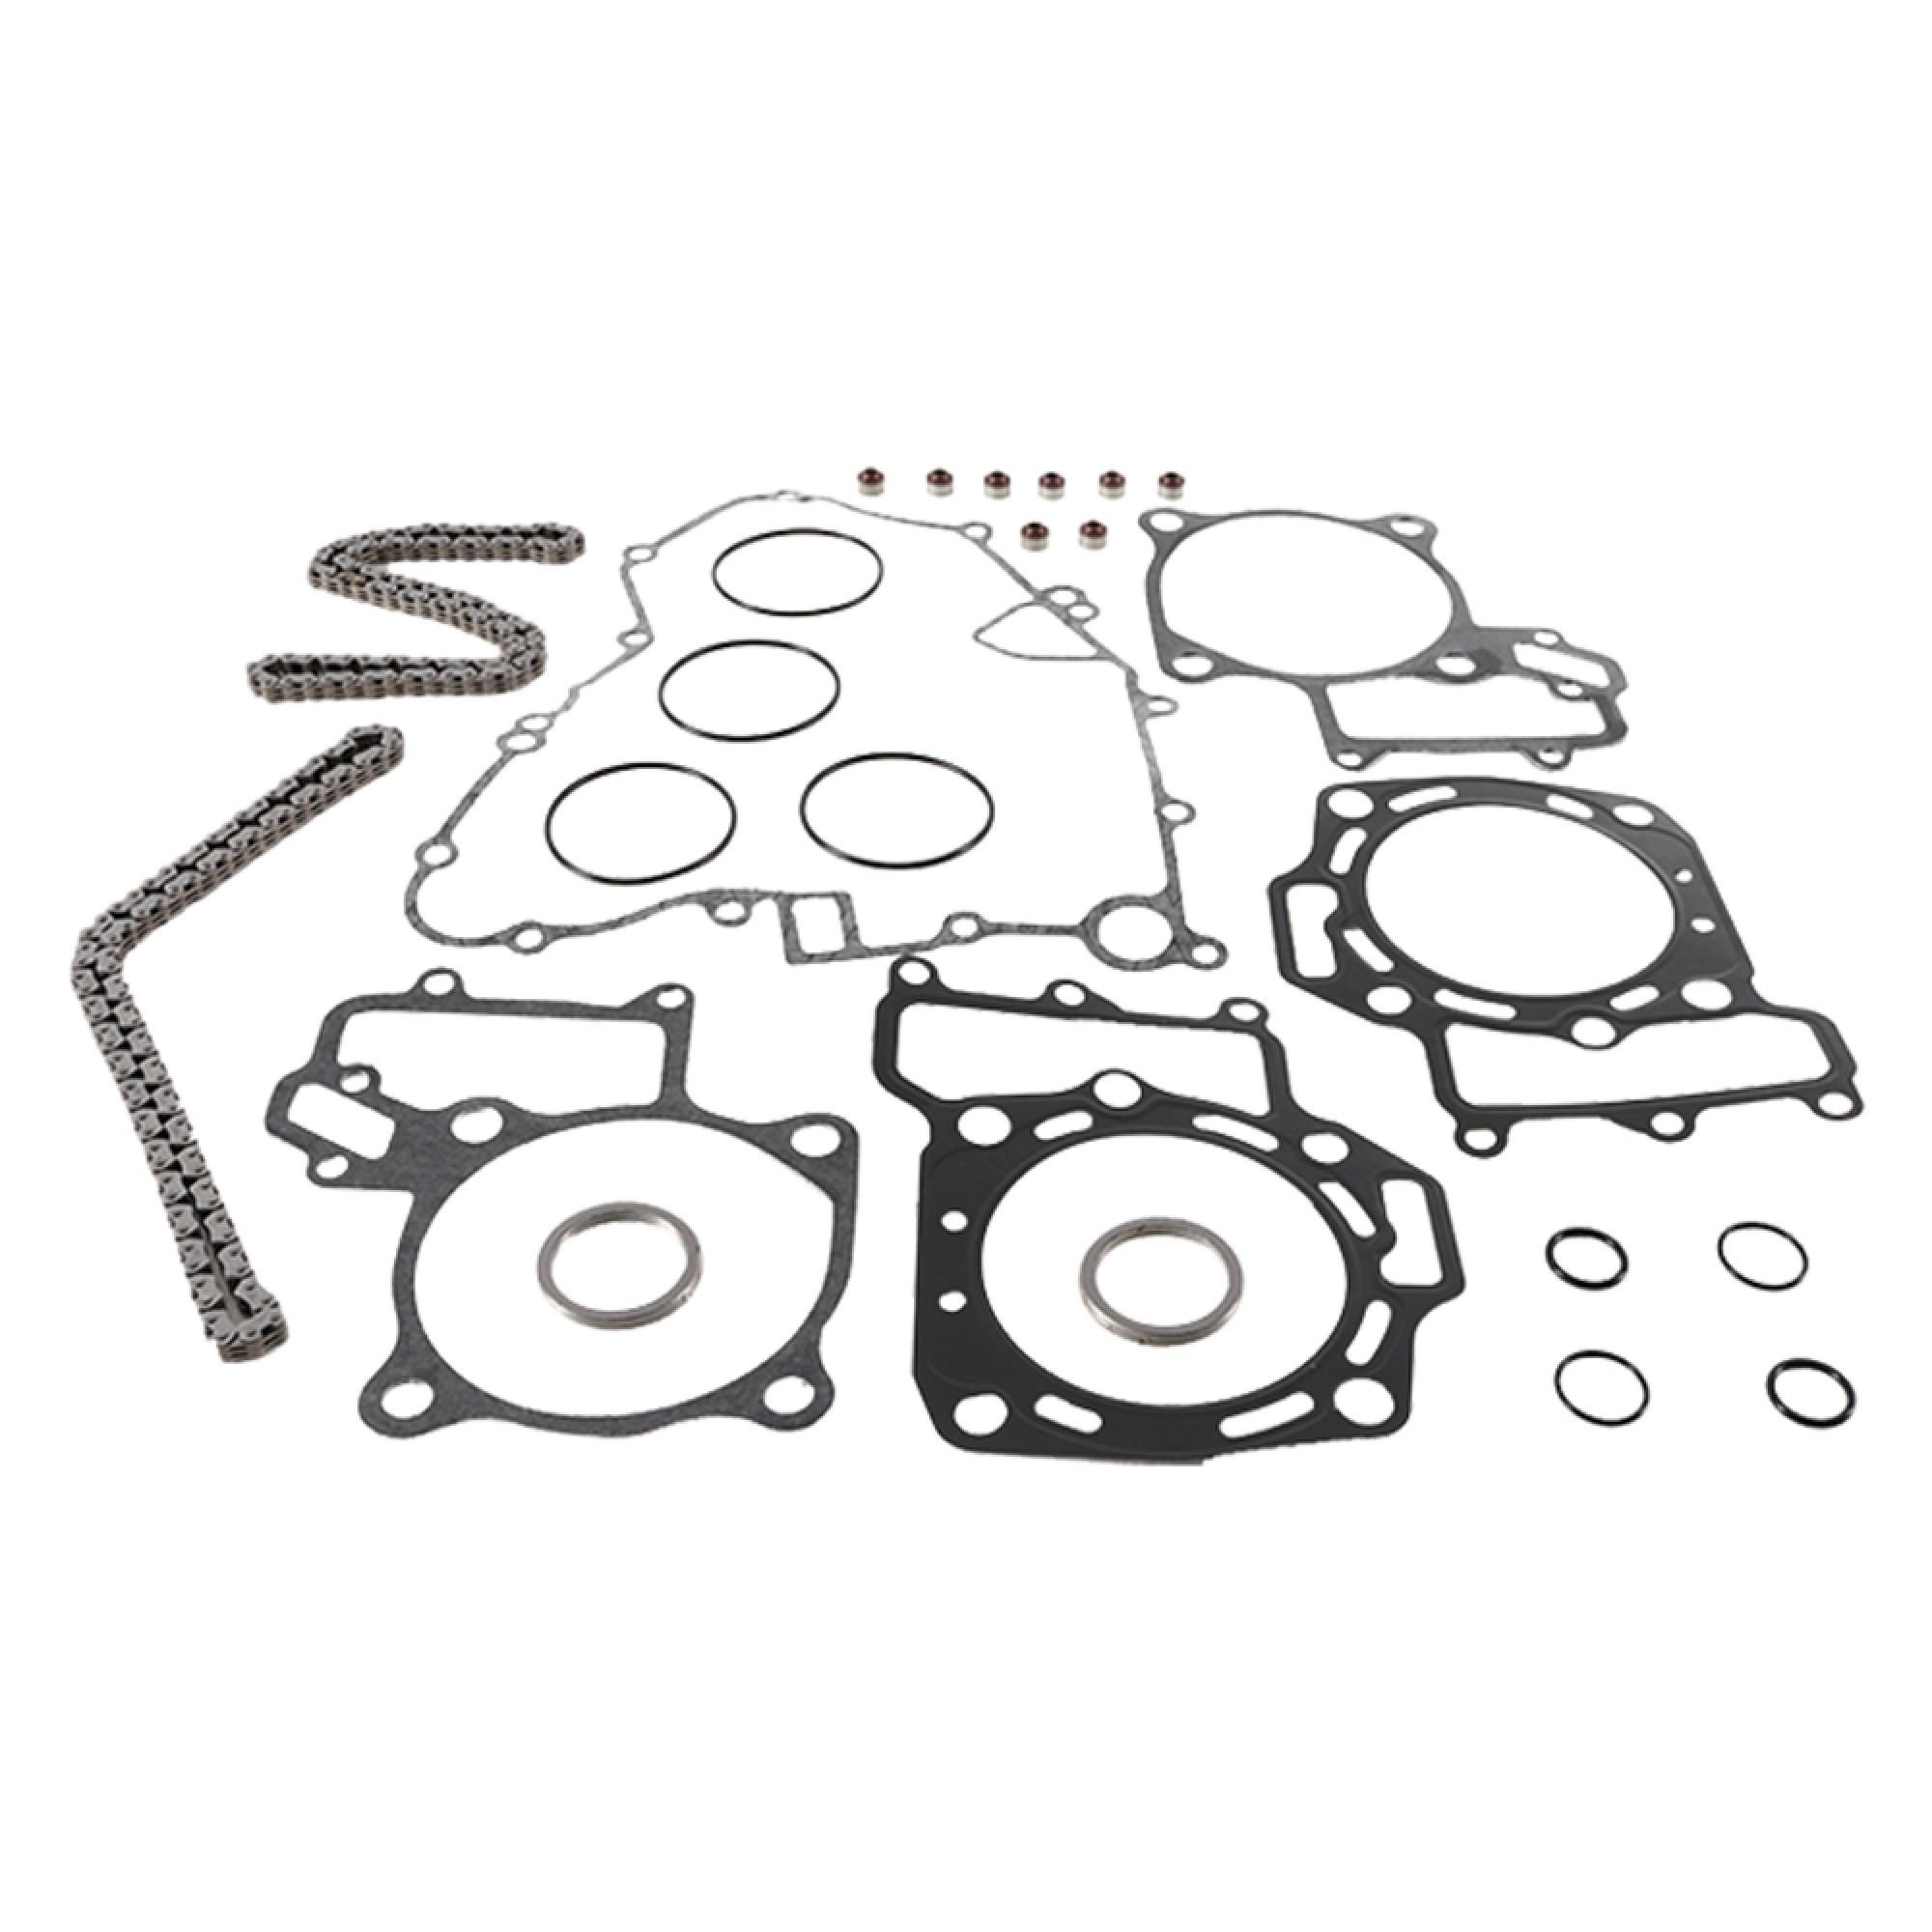 New Vertex Top End Piston Kit For Kawasaki KRF 750 Teryx